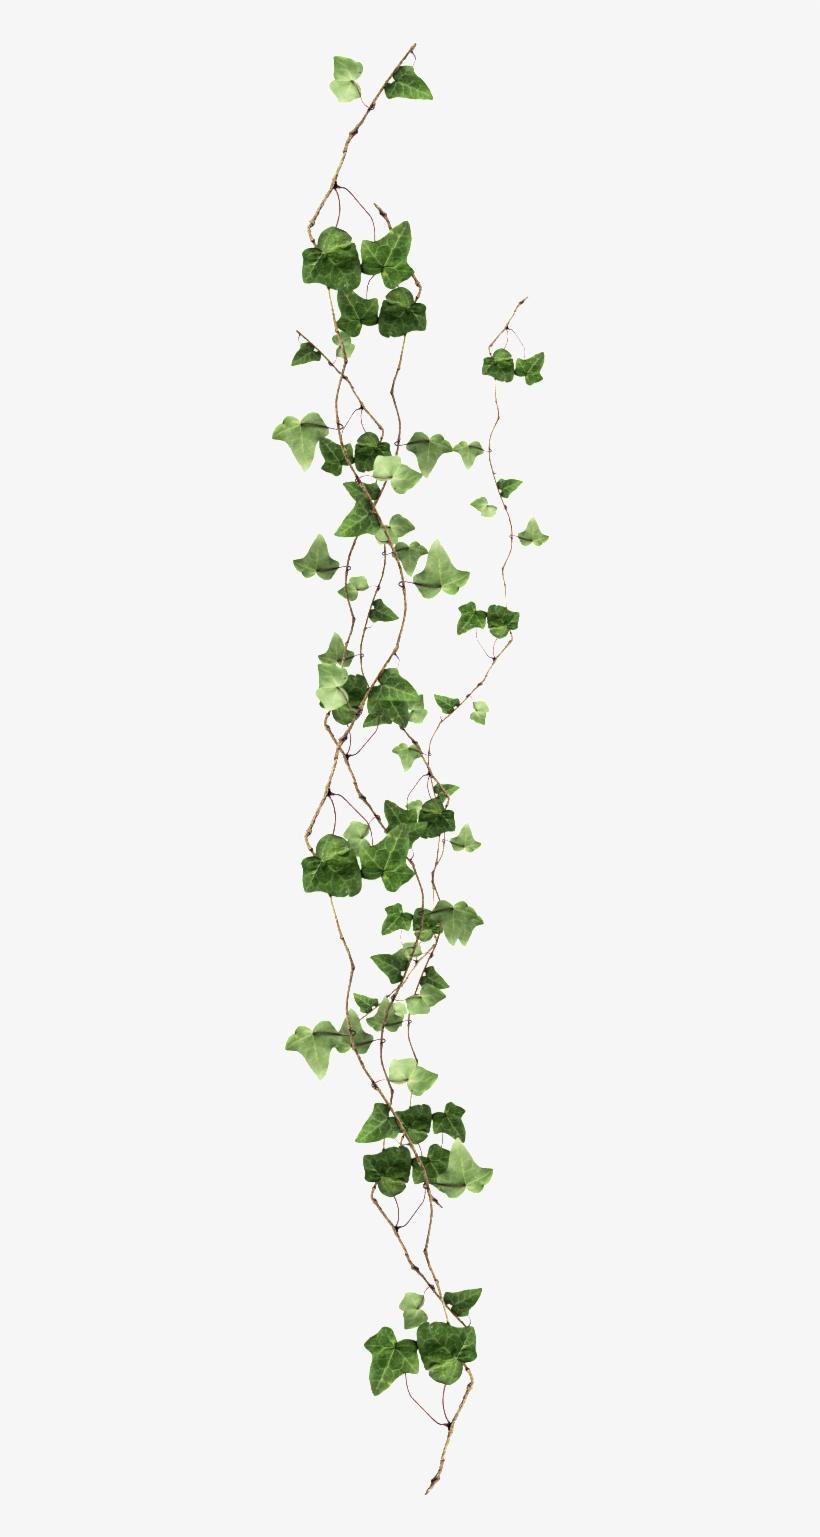 Long Vine Transparent - Ivy Png, transparent png #995572